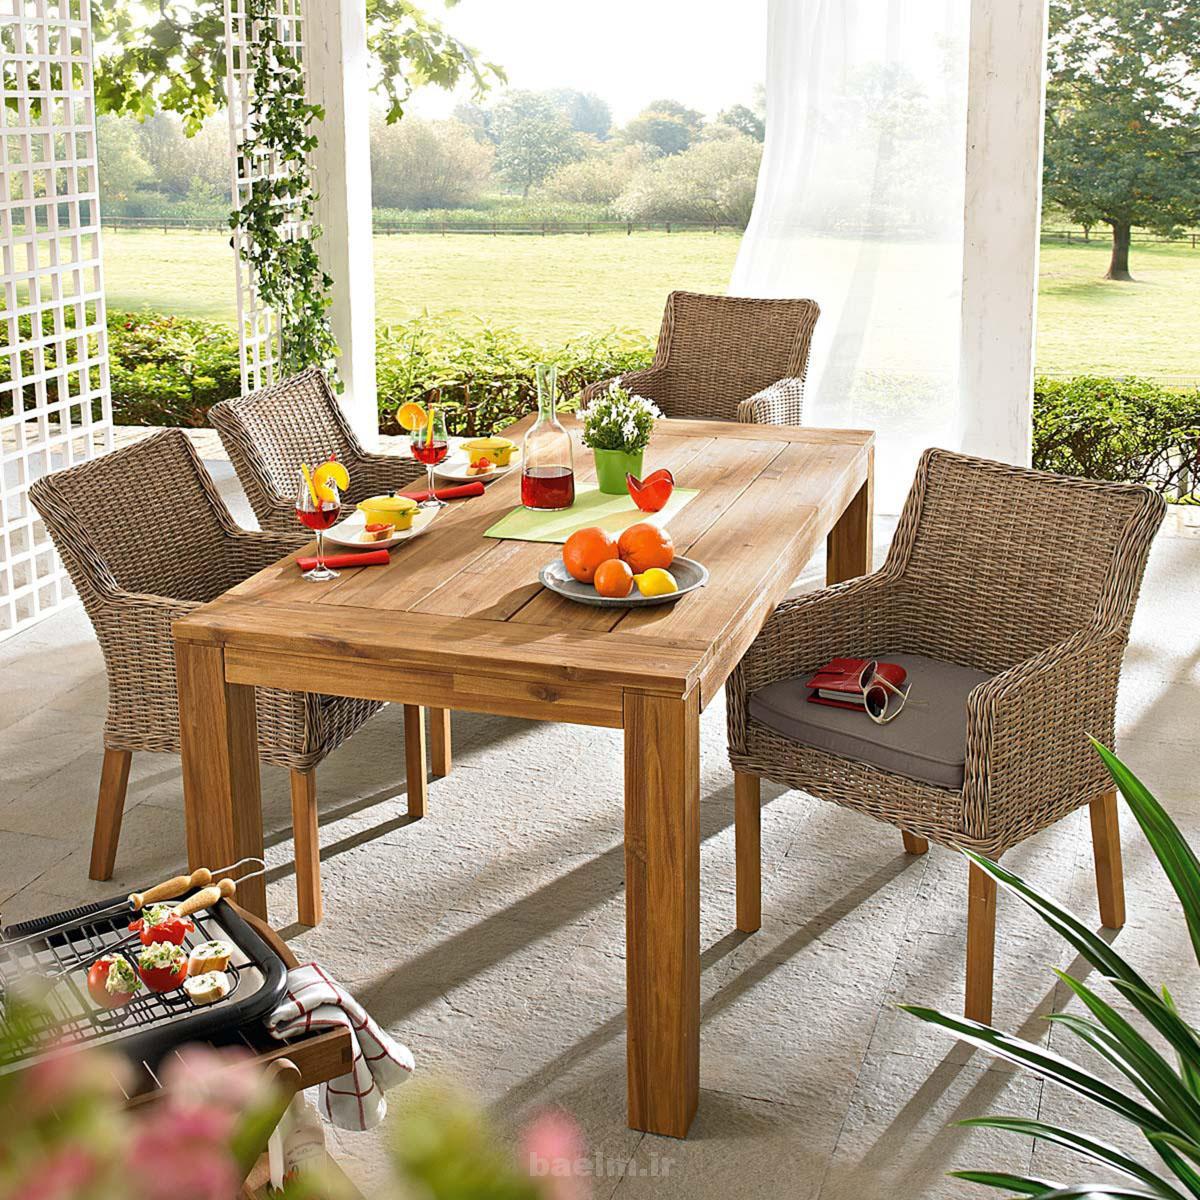 patio furniture sets 1 Patio Furniture Sets